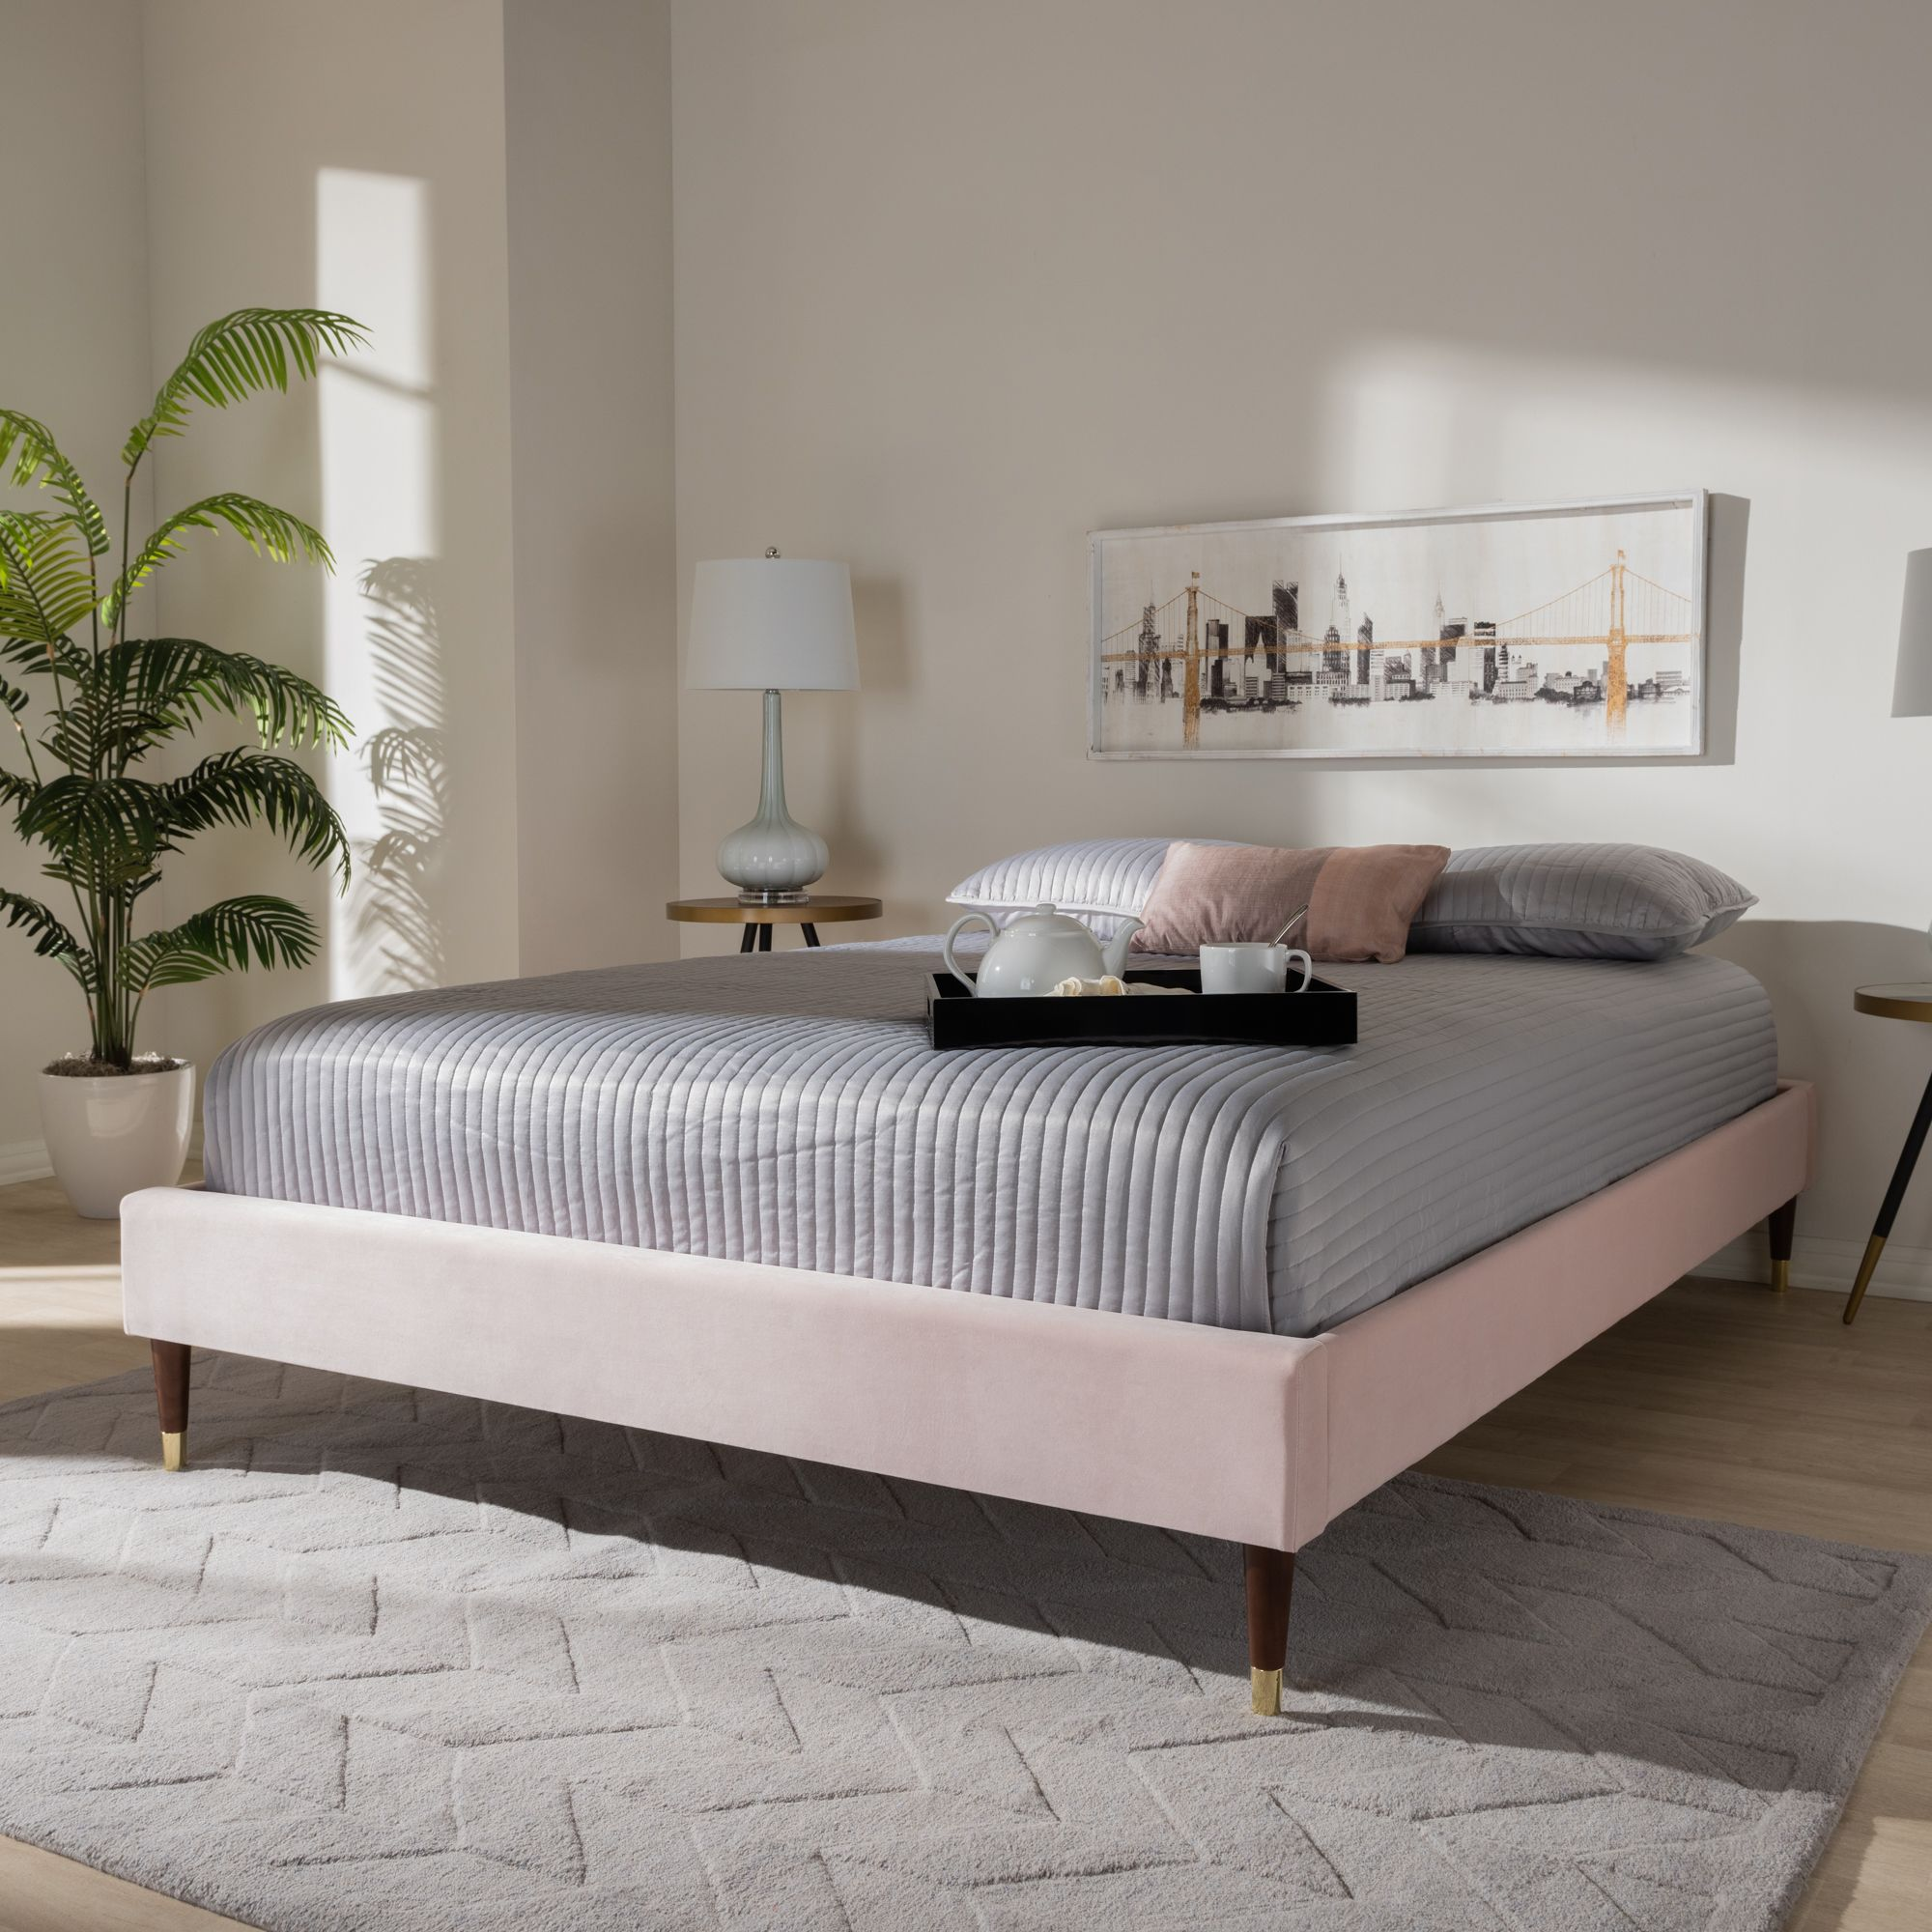 Baxton Studio Volden Glam and Luxe Light Pink Velvet